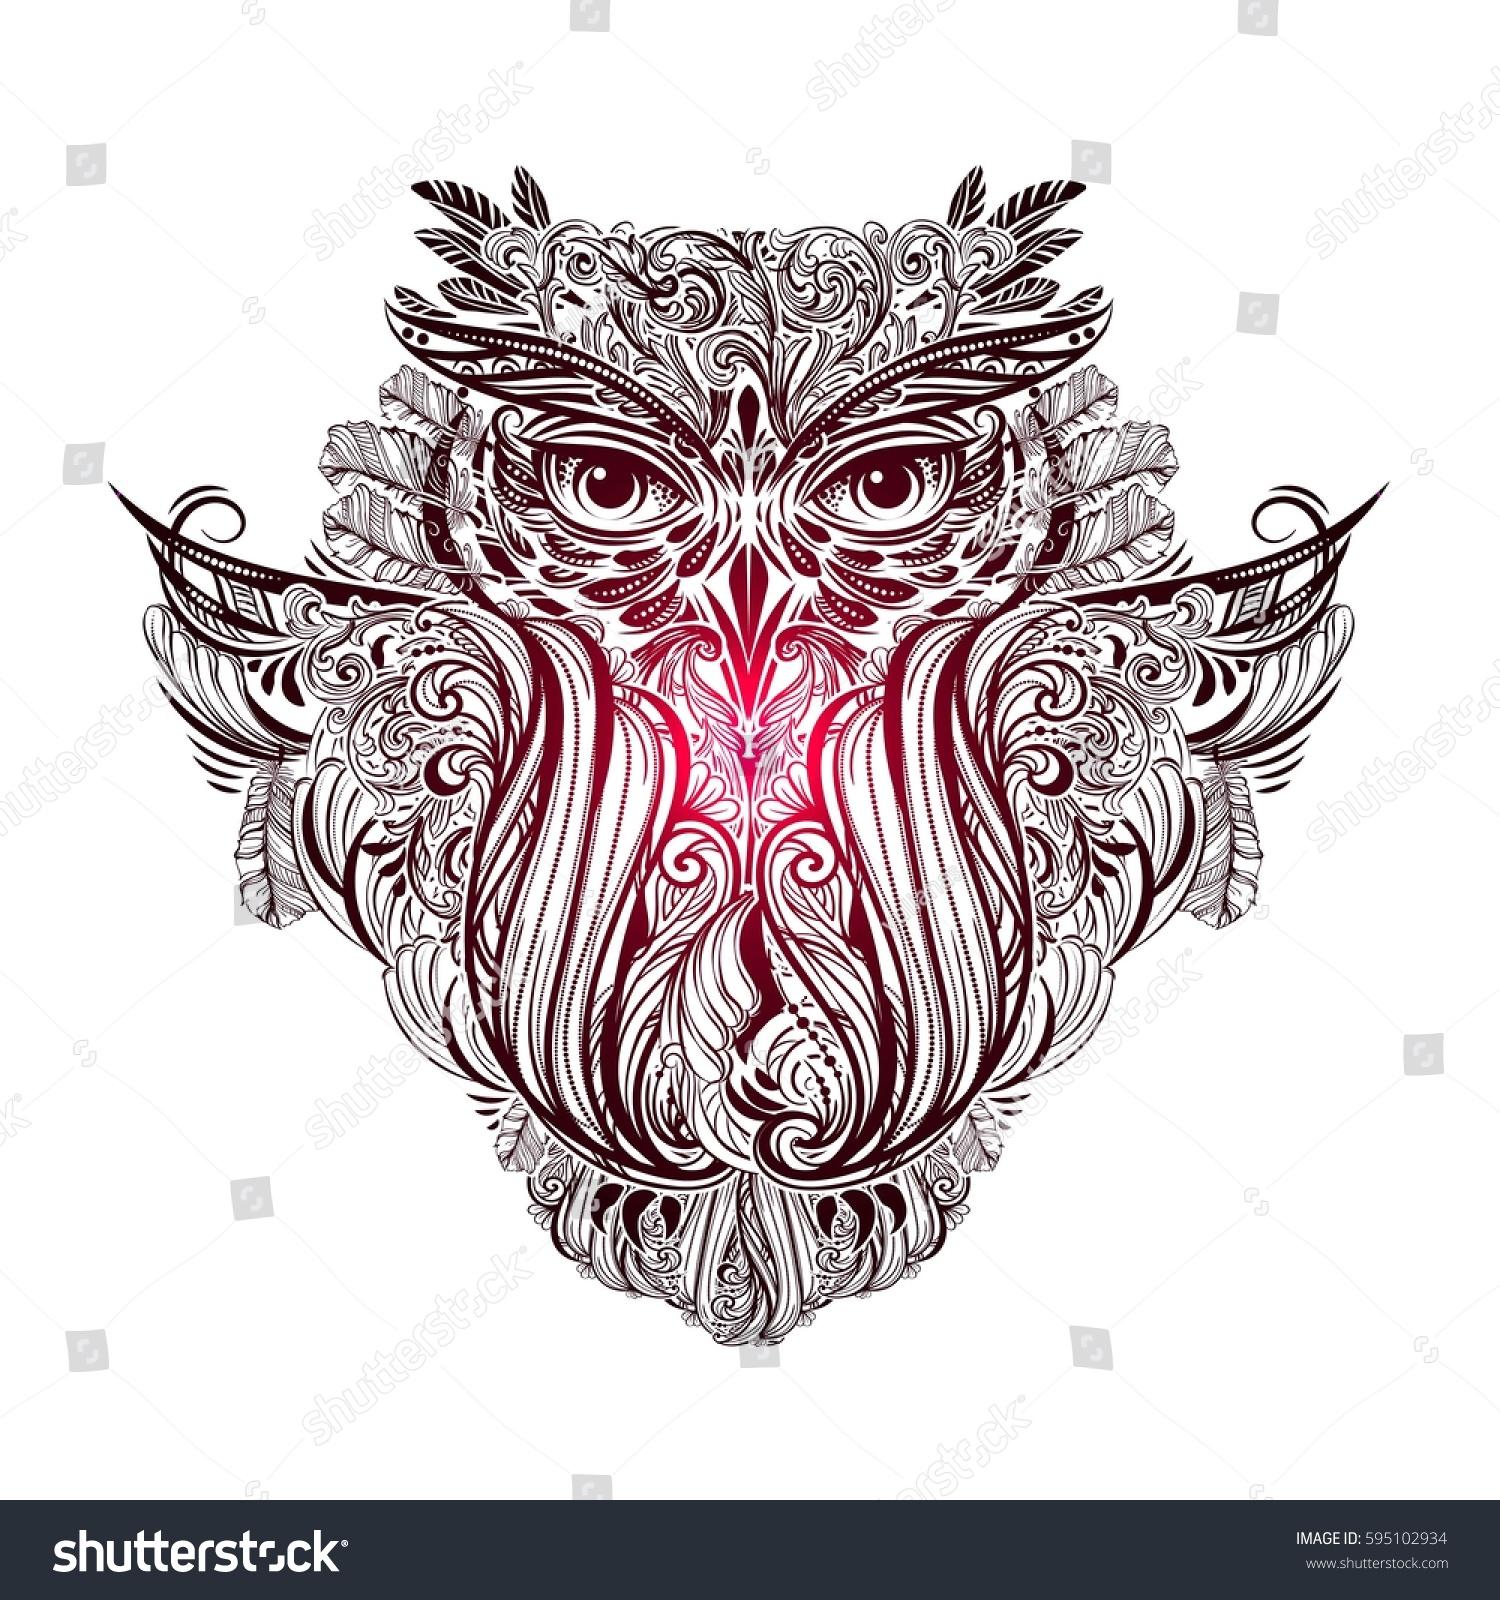 Buho Tatuaje Mandala vector de stock (libre de regalías) sobre dibujó a mano